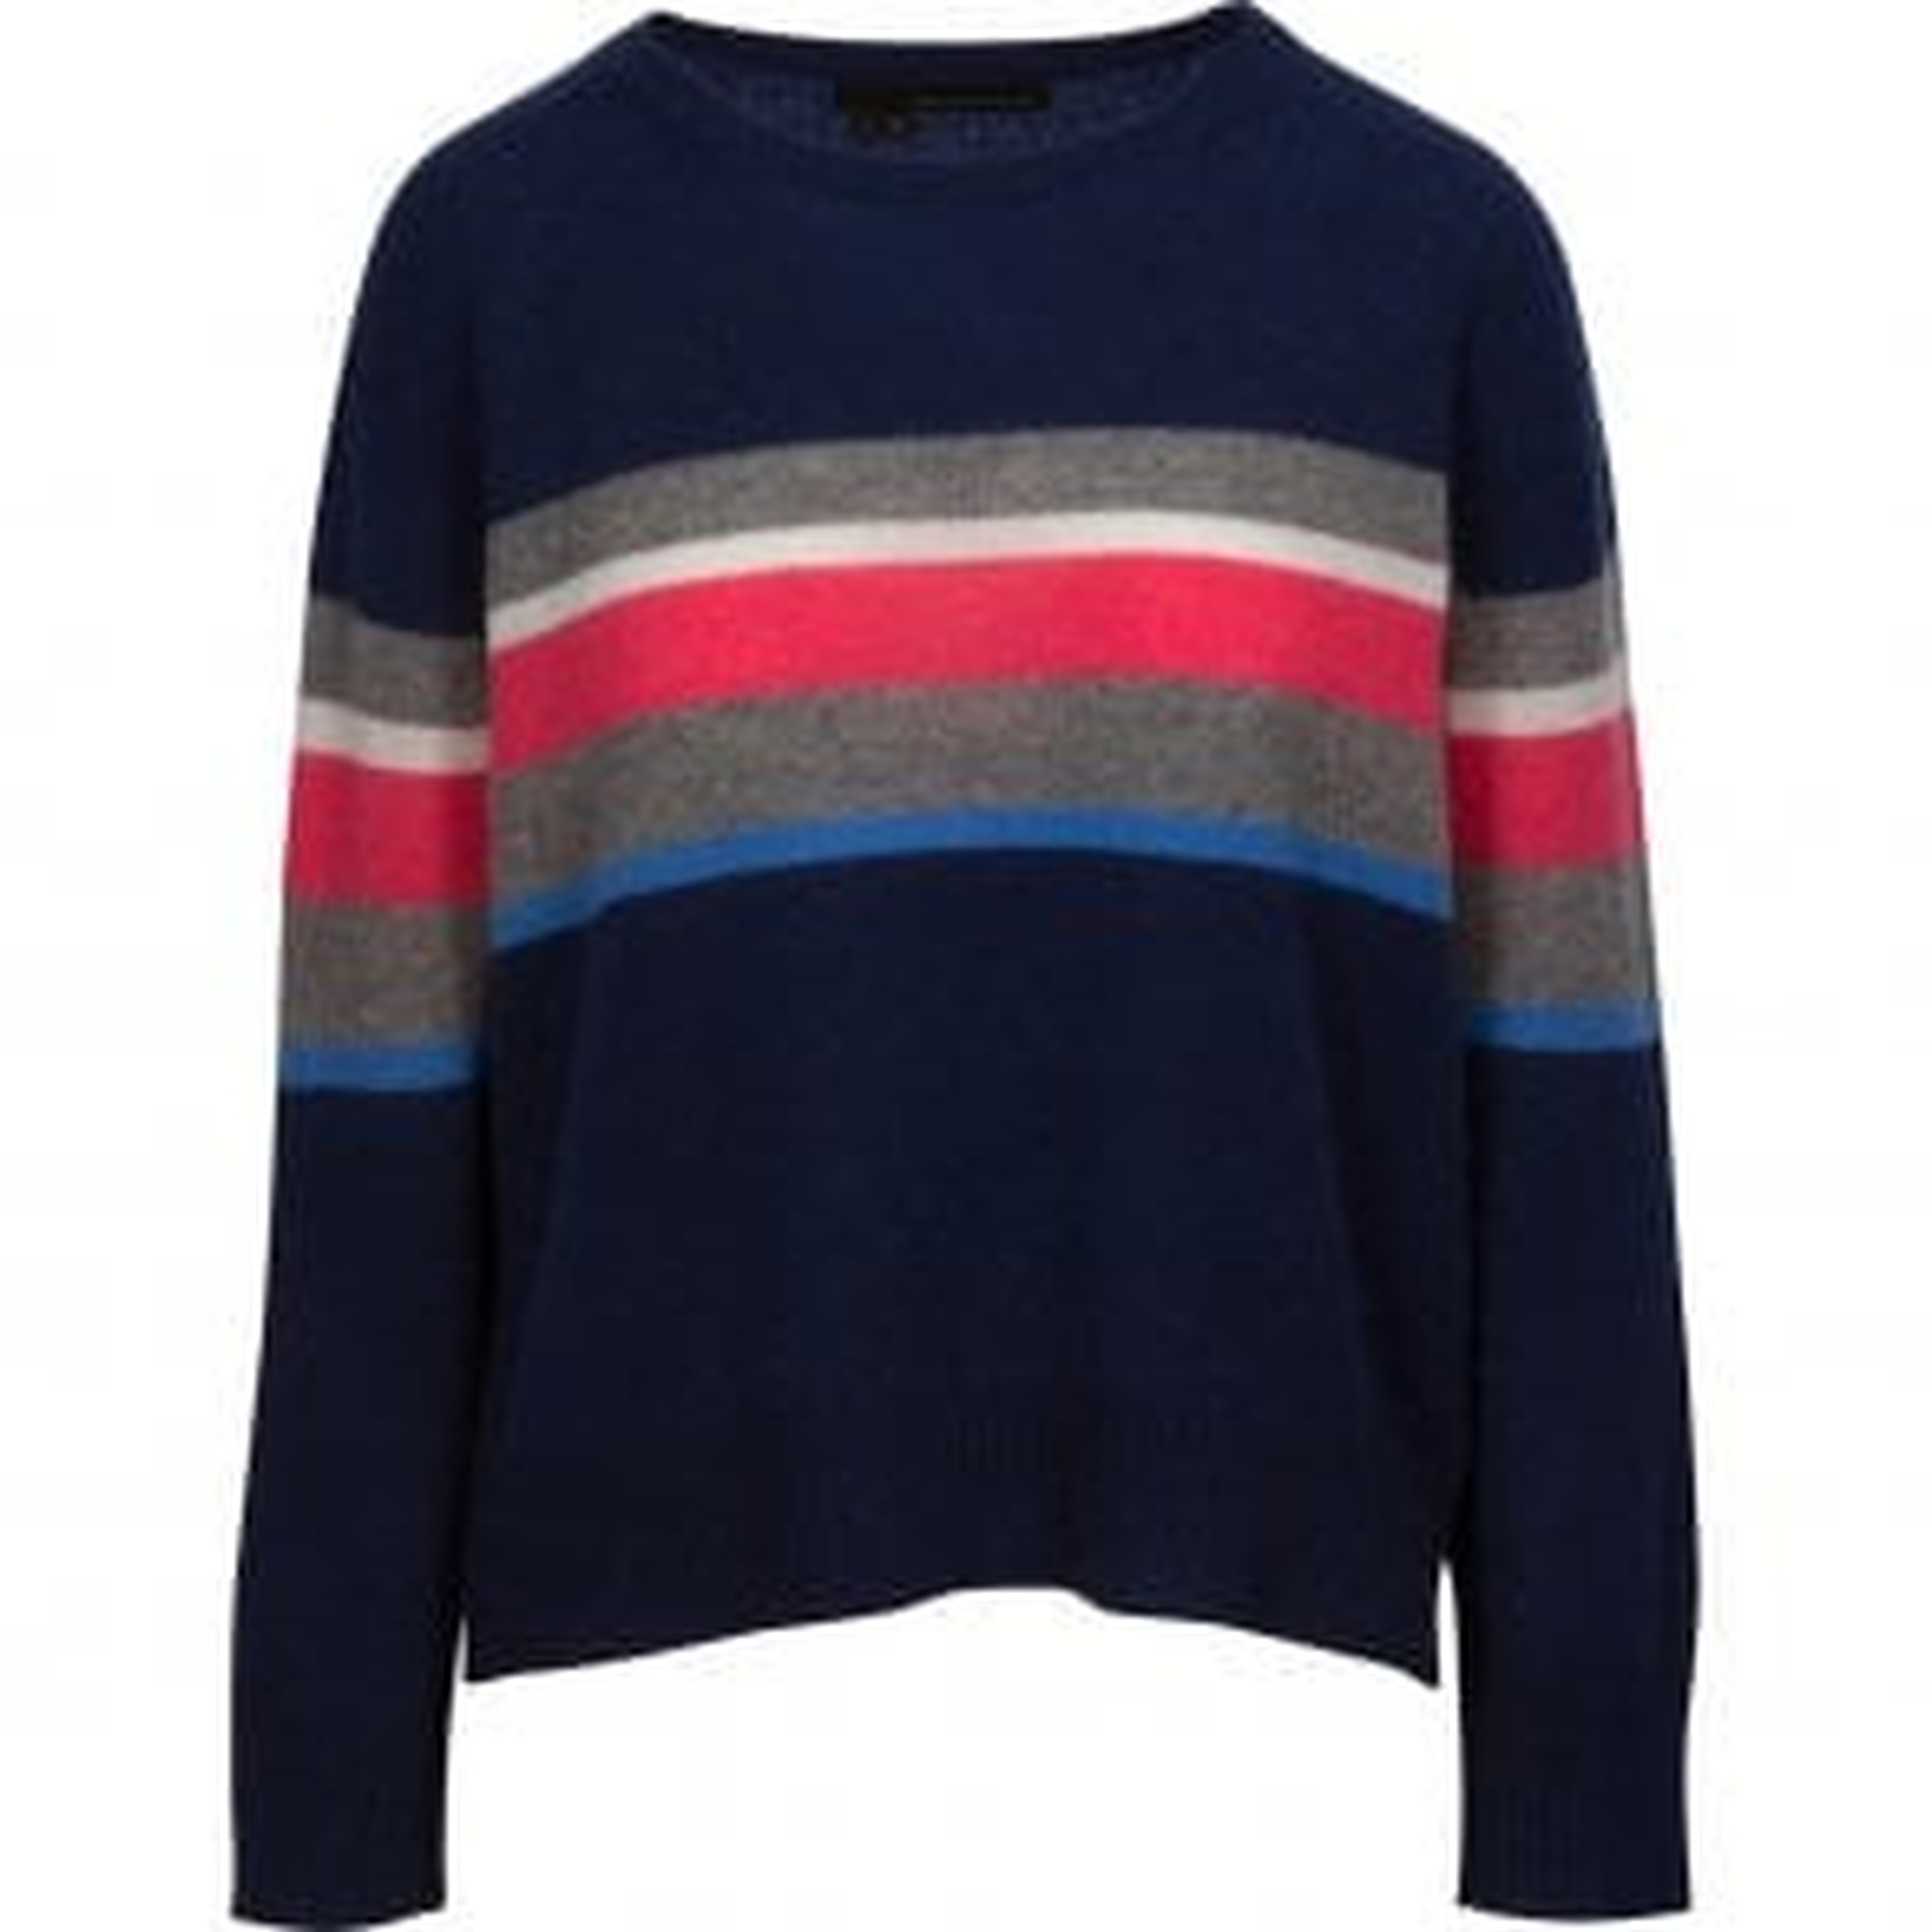 31cb8f6d9e Maison Labiche Amour Short Sleeve T-Shirt in Camel and White Stripe ...